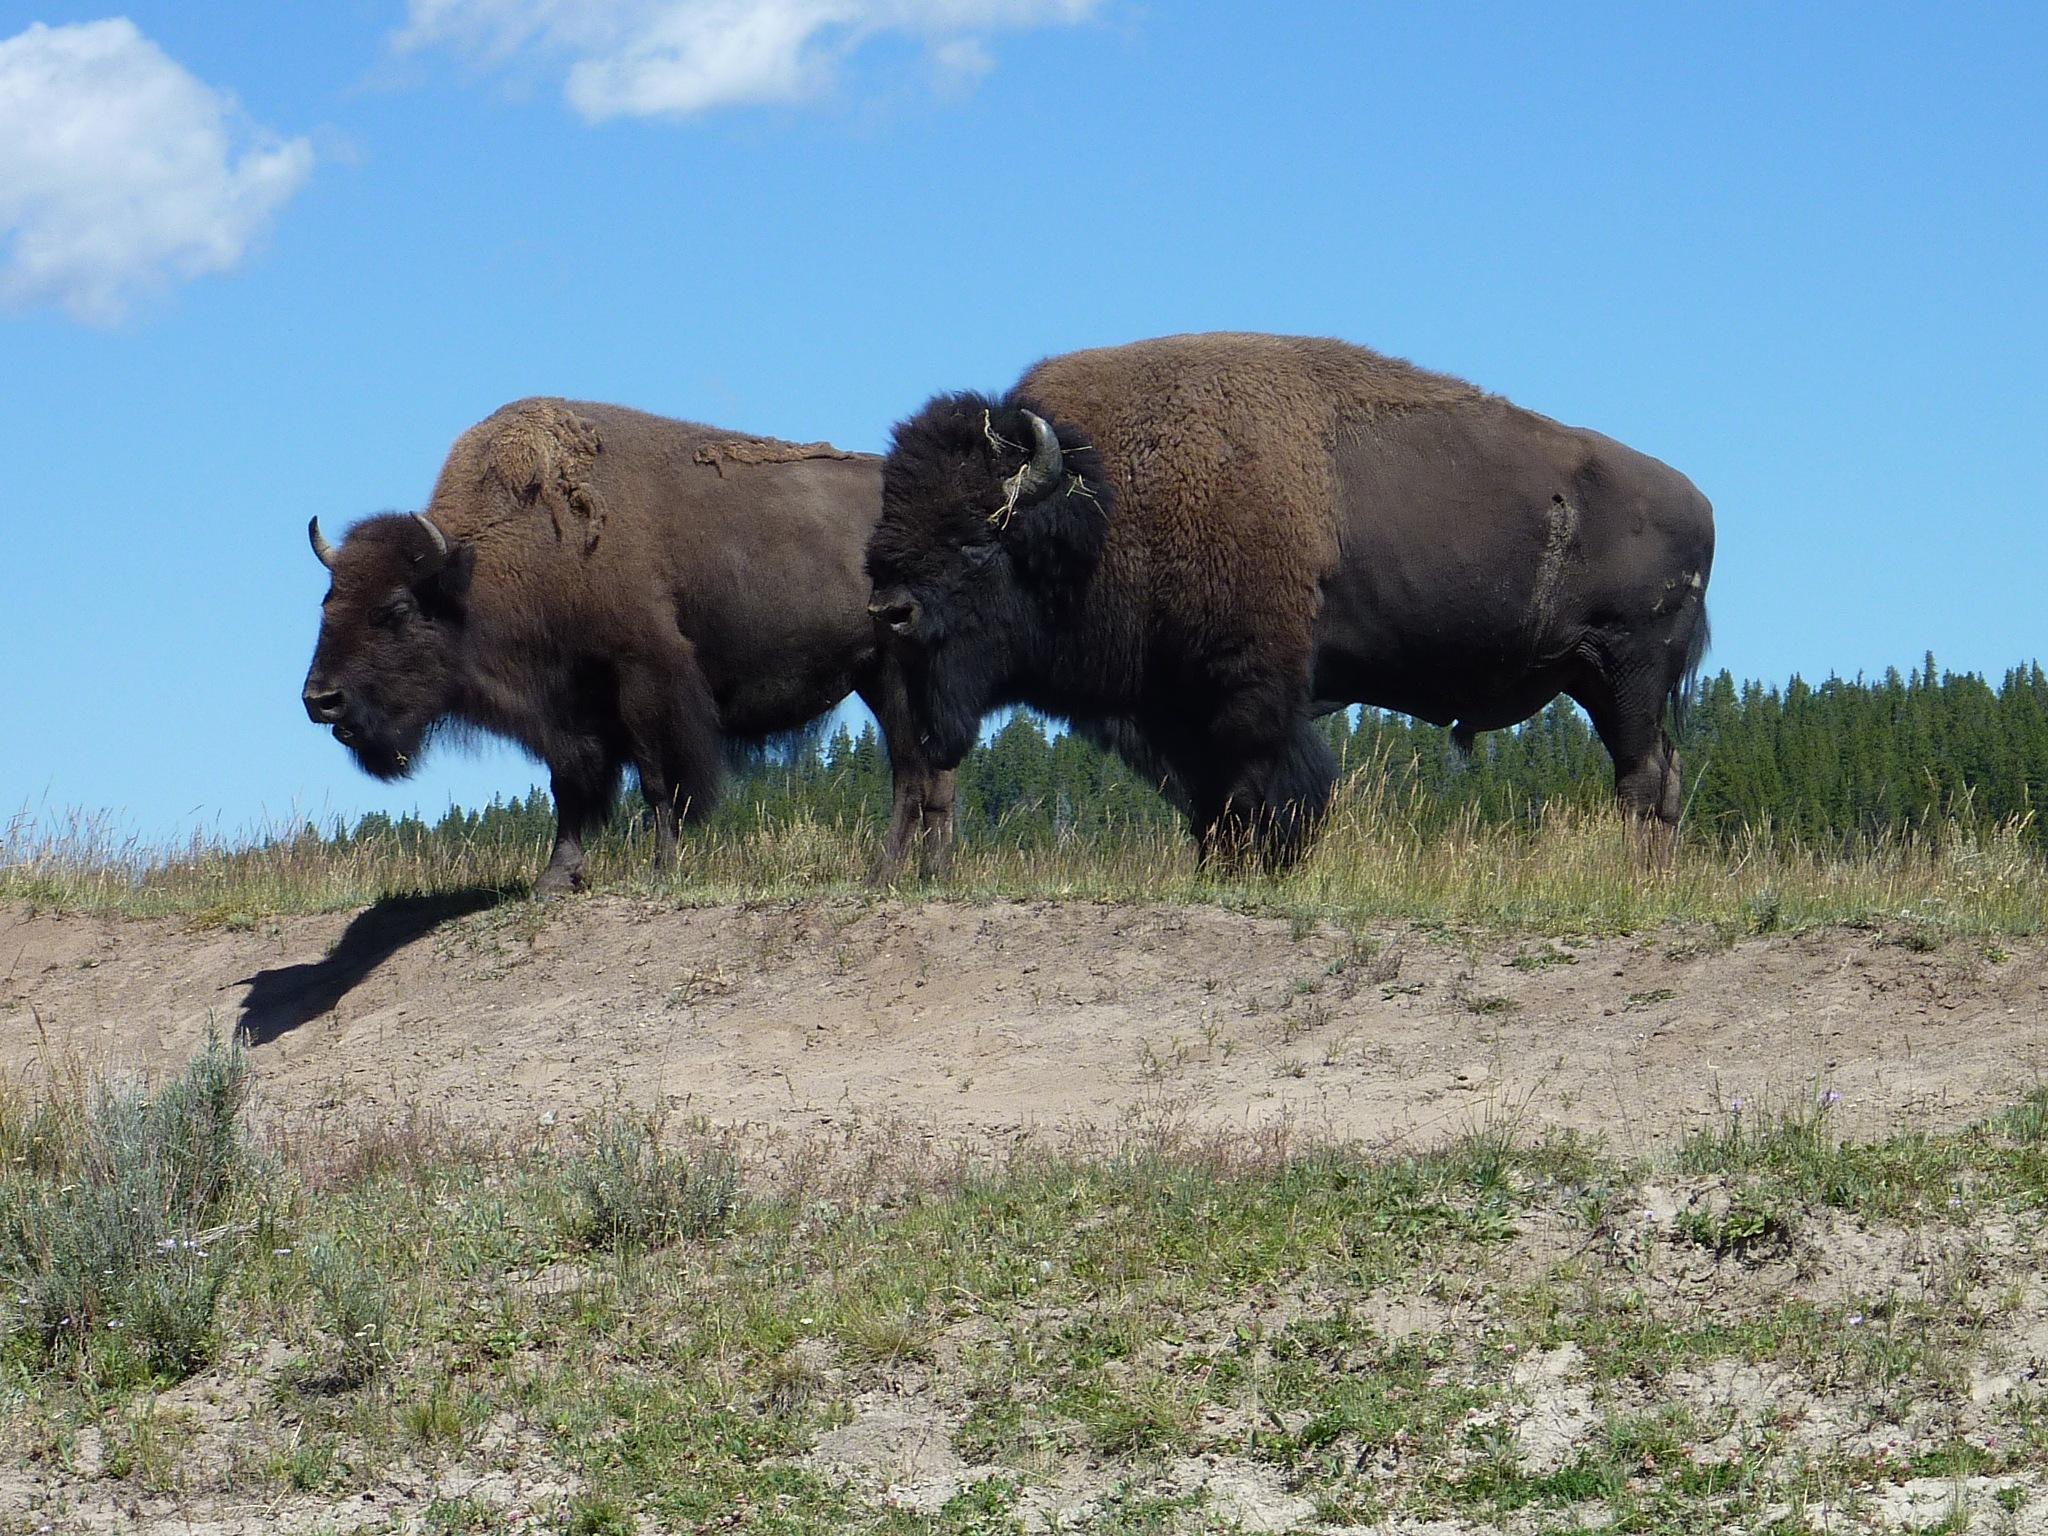 Bison in Yellowstone by stargazingadventures